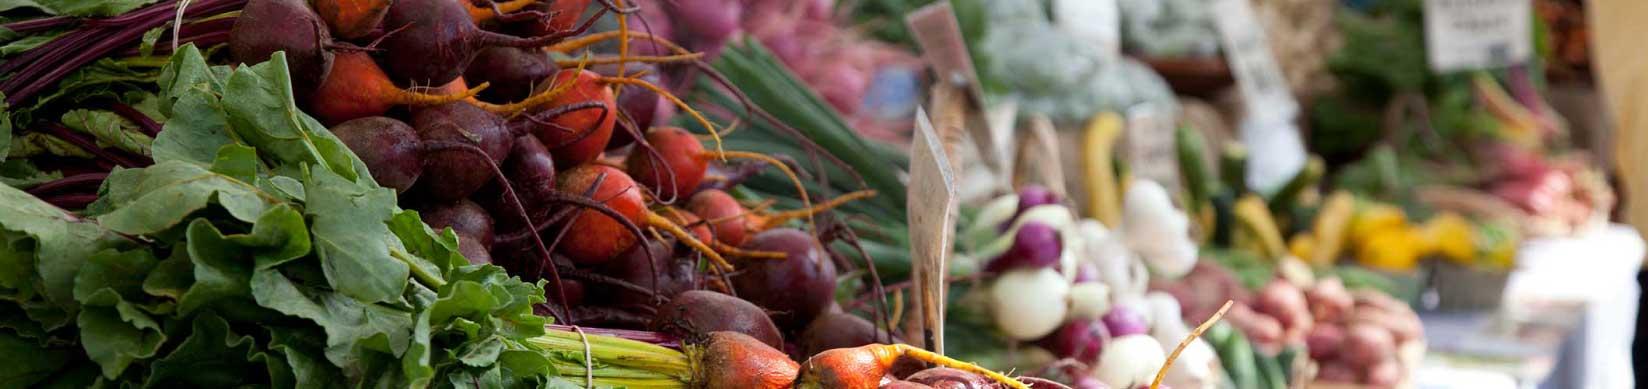 Home - Ottawa Farmers' Market